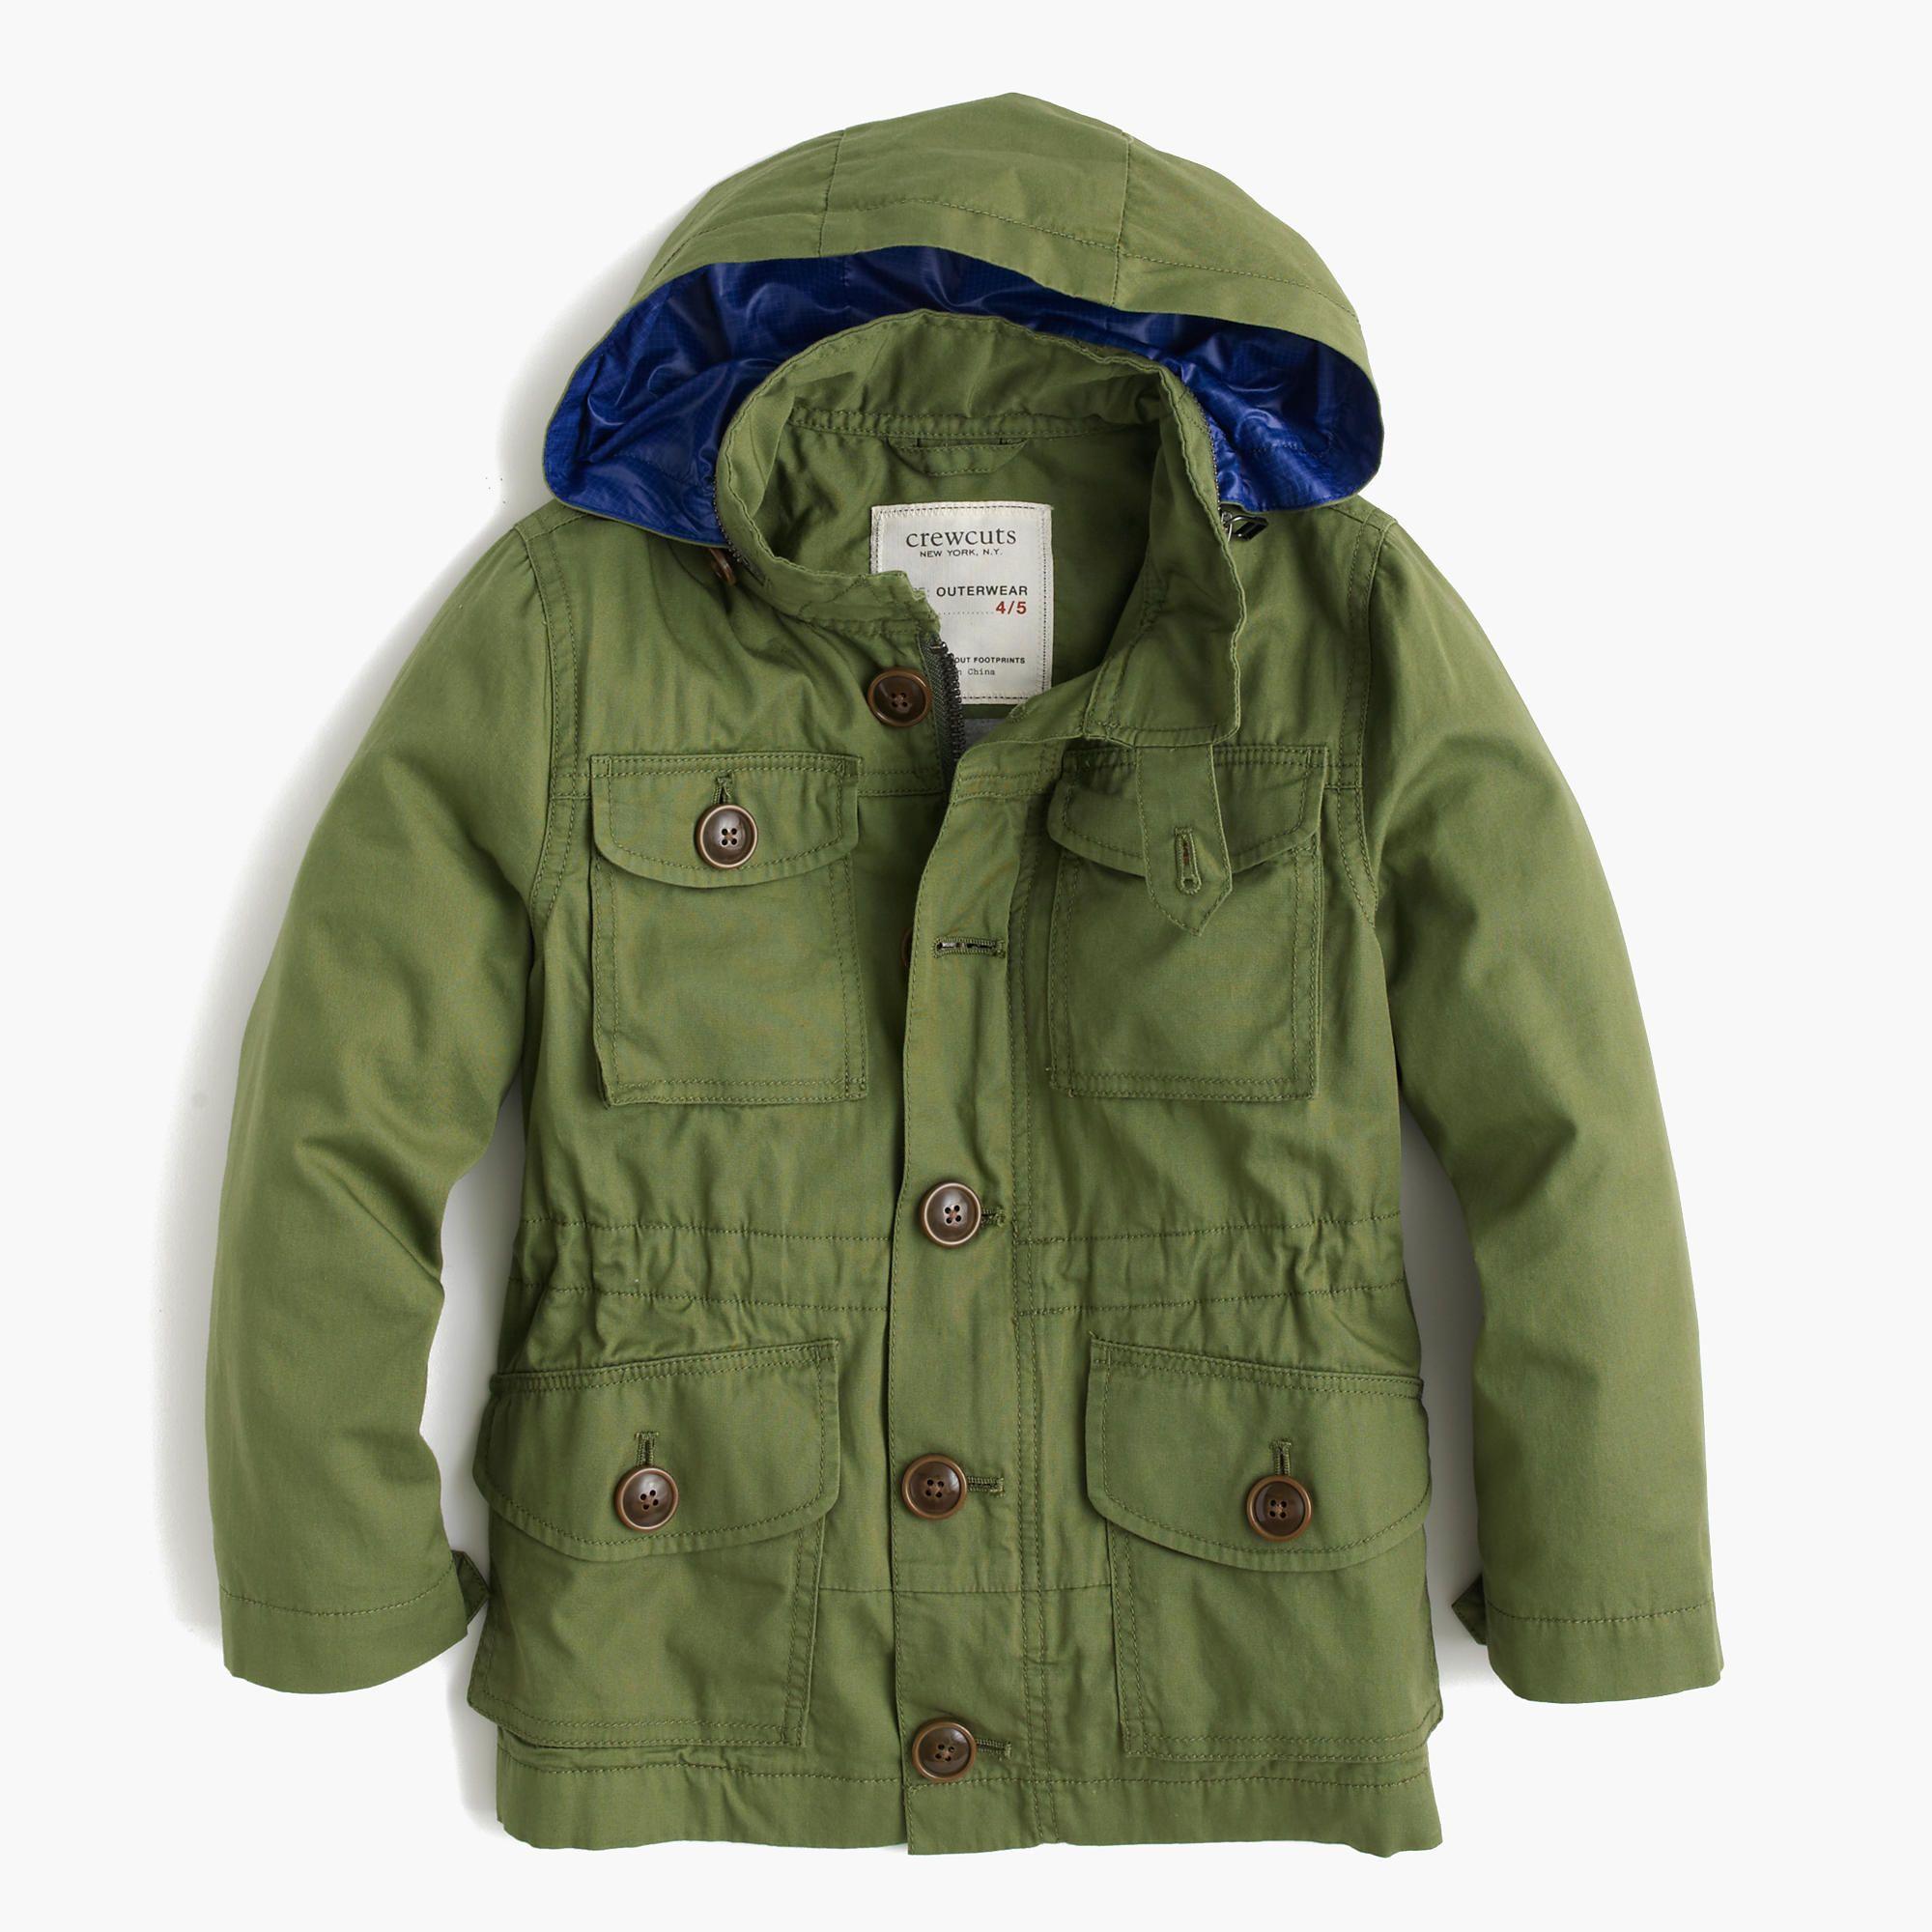 Kids Field Mechanic Jacket Lightweight Denim J Crew Mechanics Jacket Jackets Kids Outerwear [ 2000 x 2000 Pixel ]